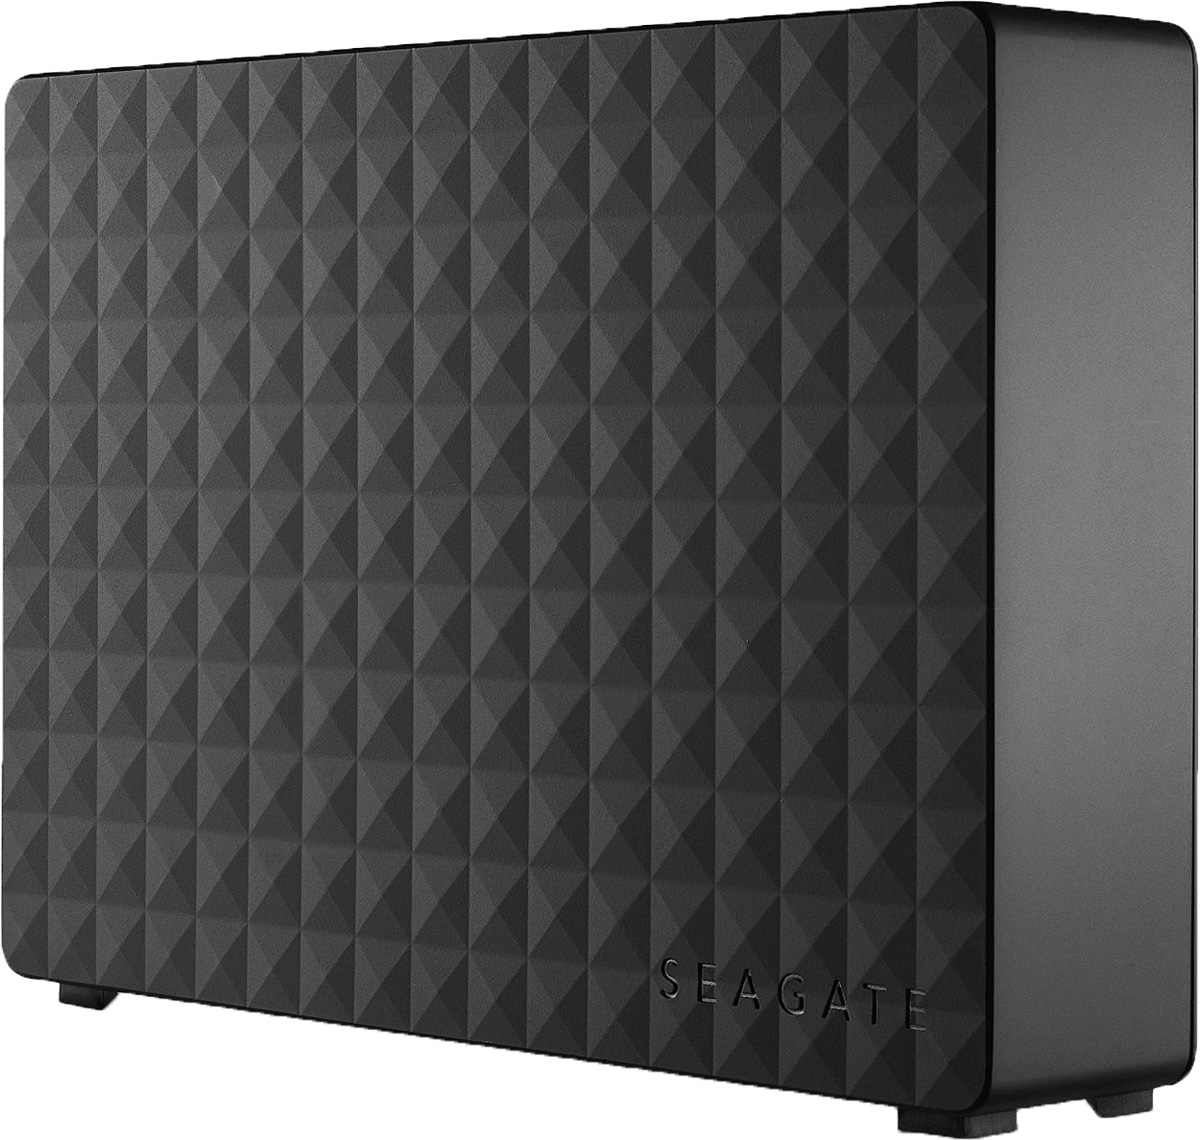 Seagate Expansion Desk 4TB USB 3.0 внешний жесткий диск (STEB4000200) - Носители информации